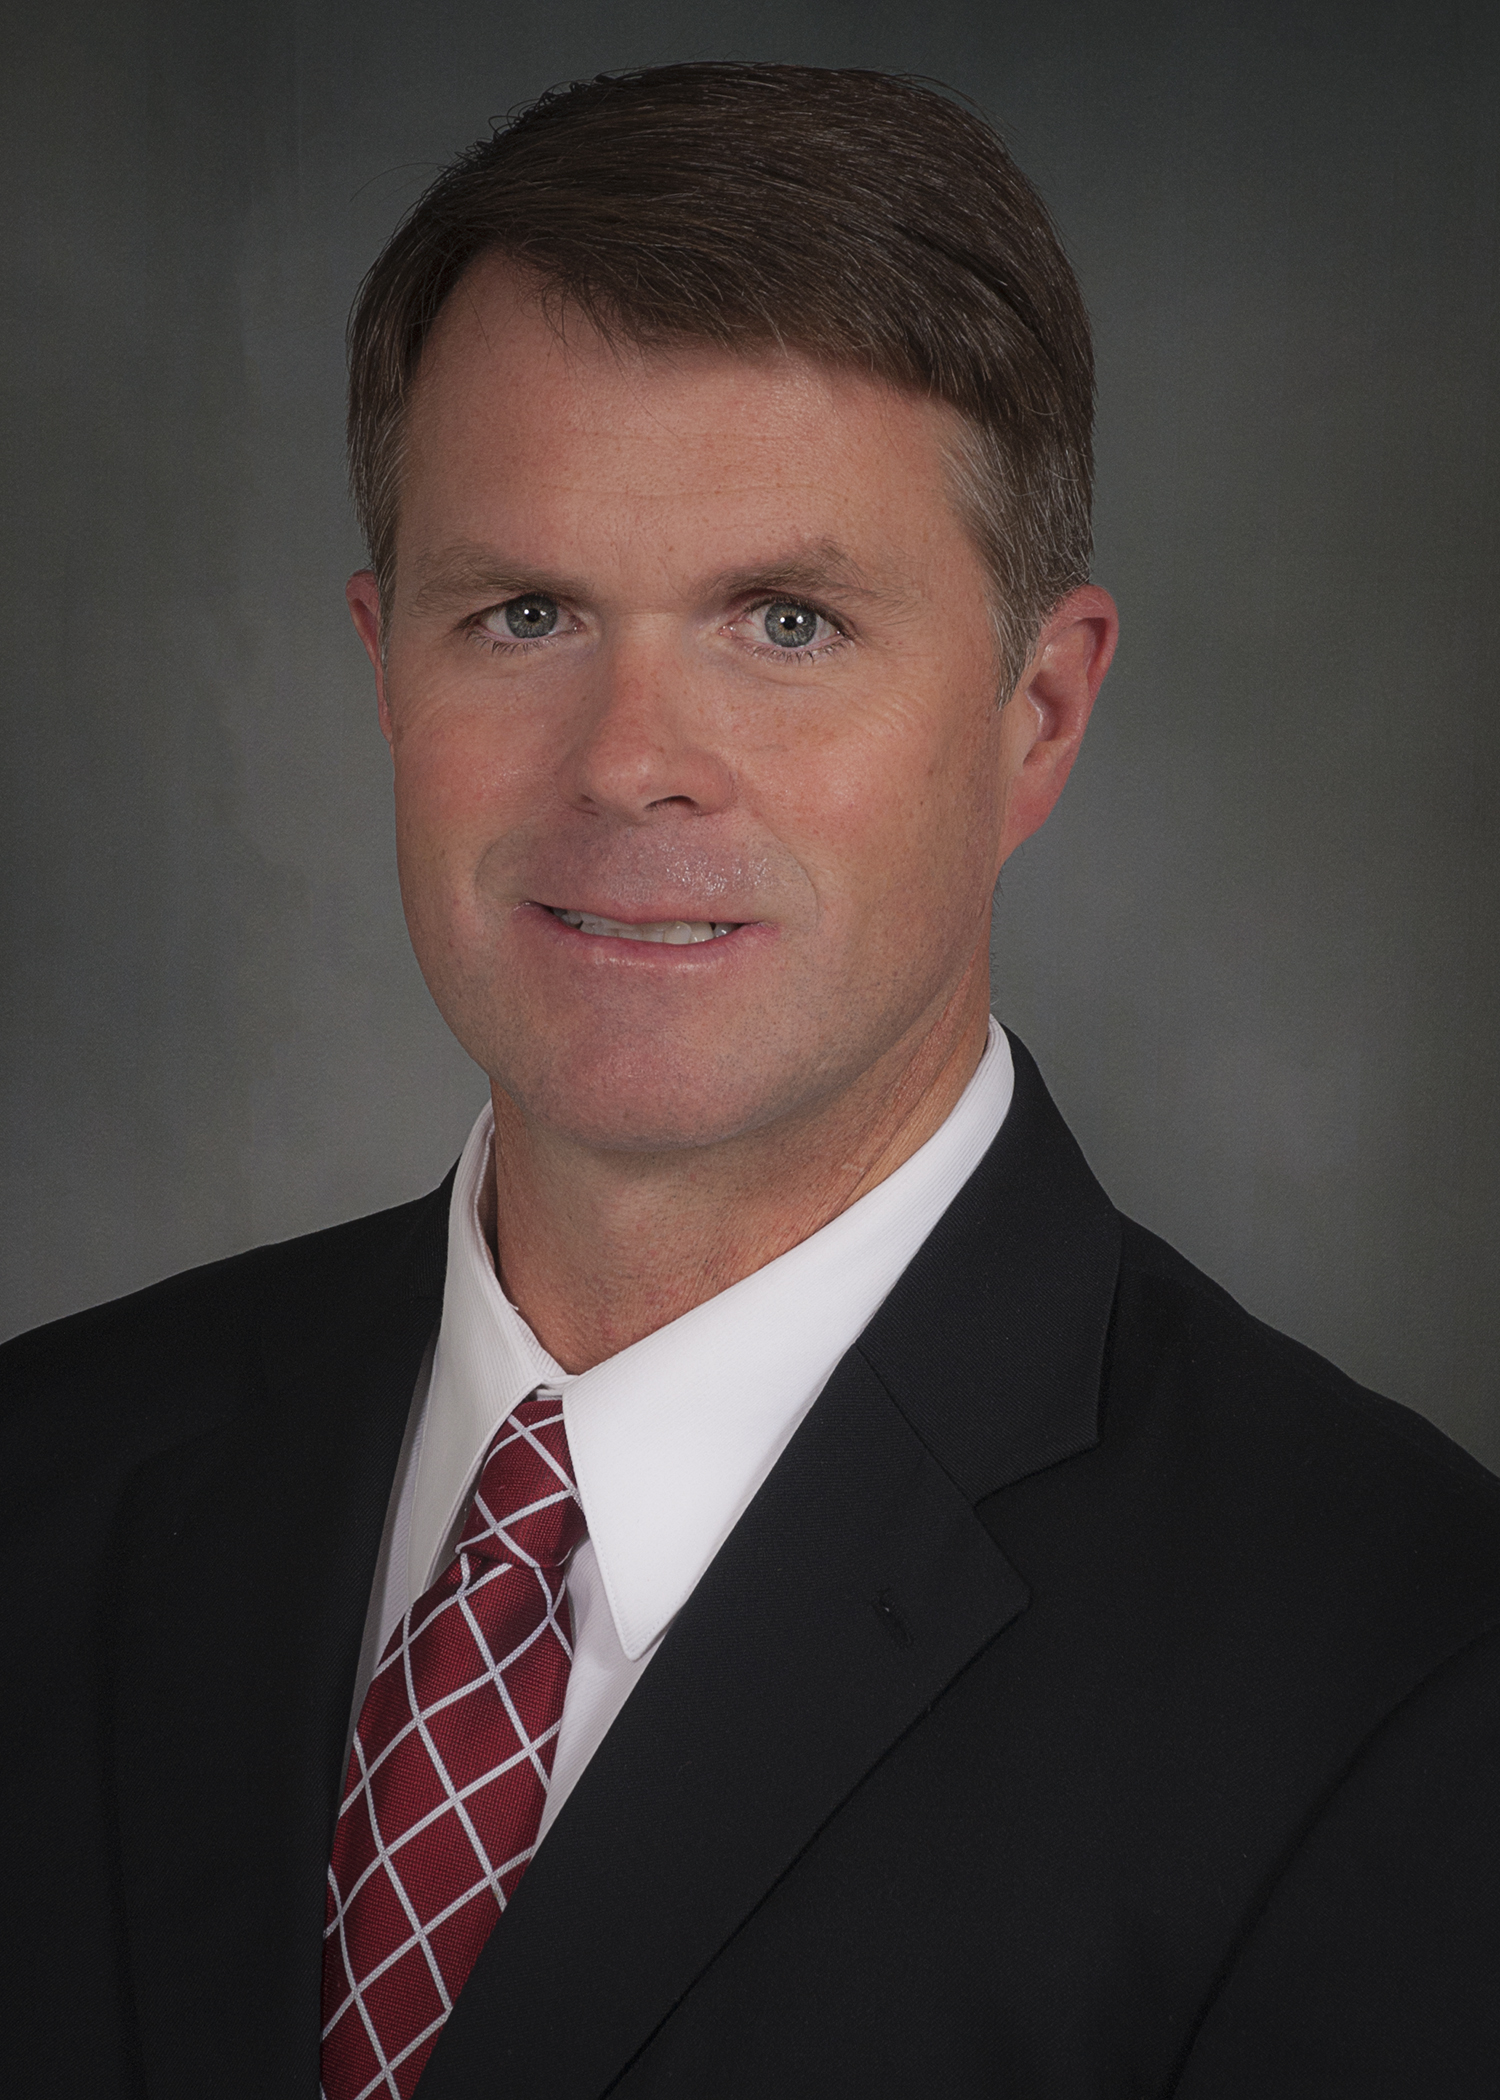 M.ShaunMachen, MD